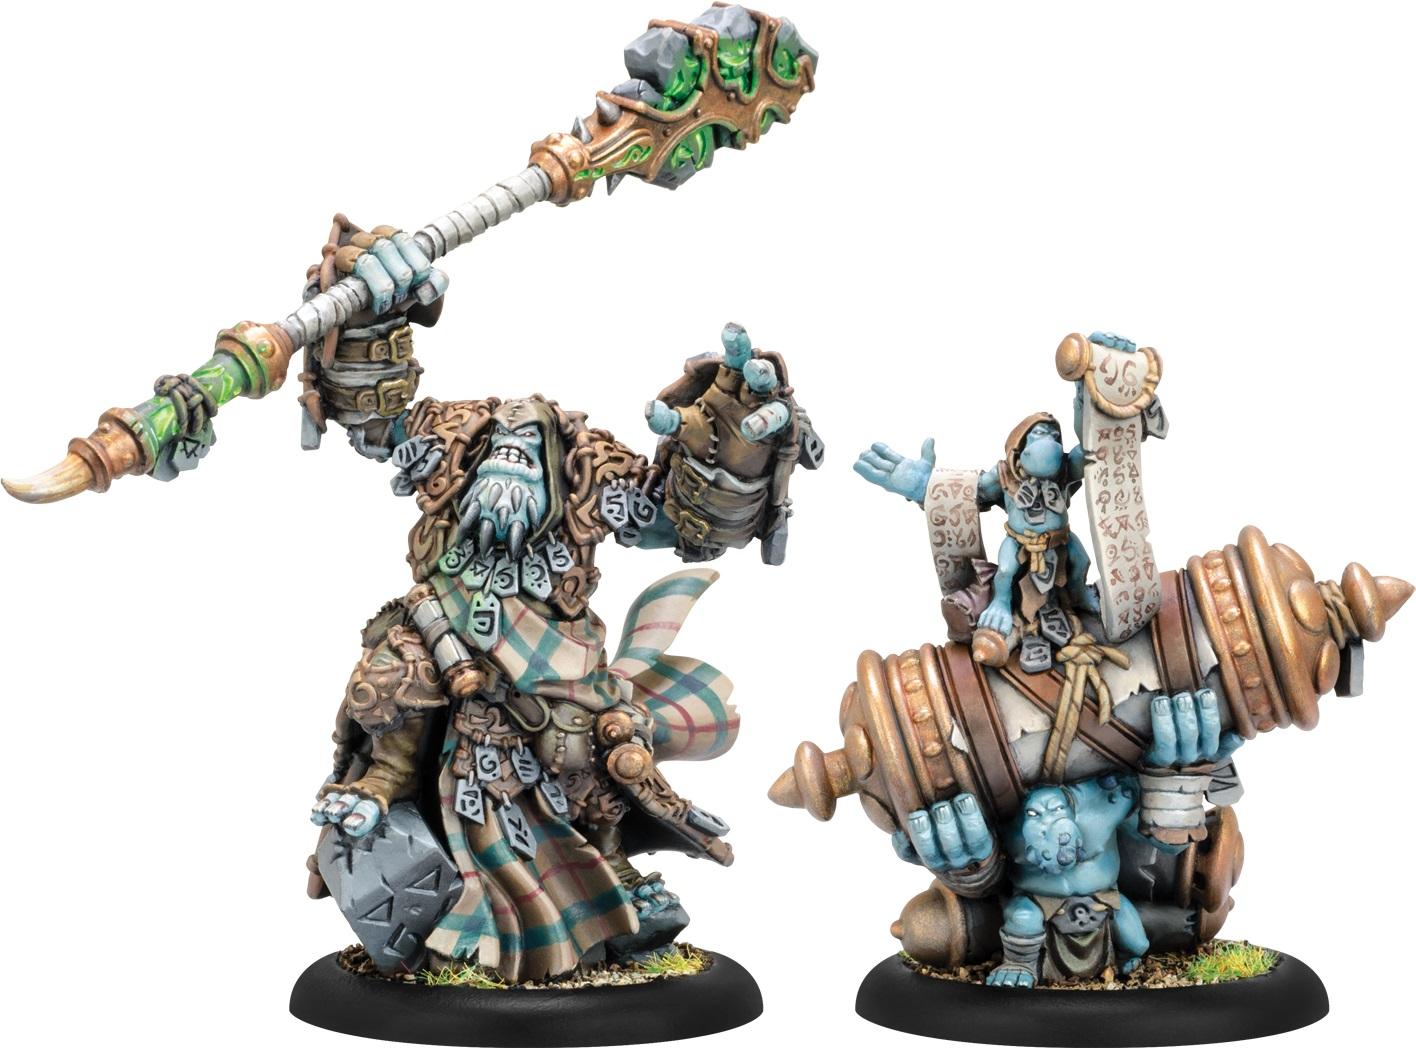 Hordes: Trollblood Hoarluk Doomshaper Dire Prophet Epic Trollkin Warlock Unit (2)(resin And White Metal) Box Front